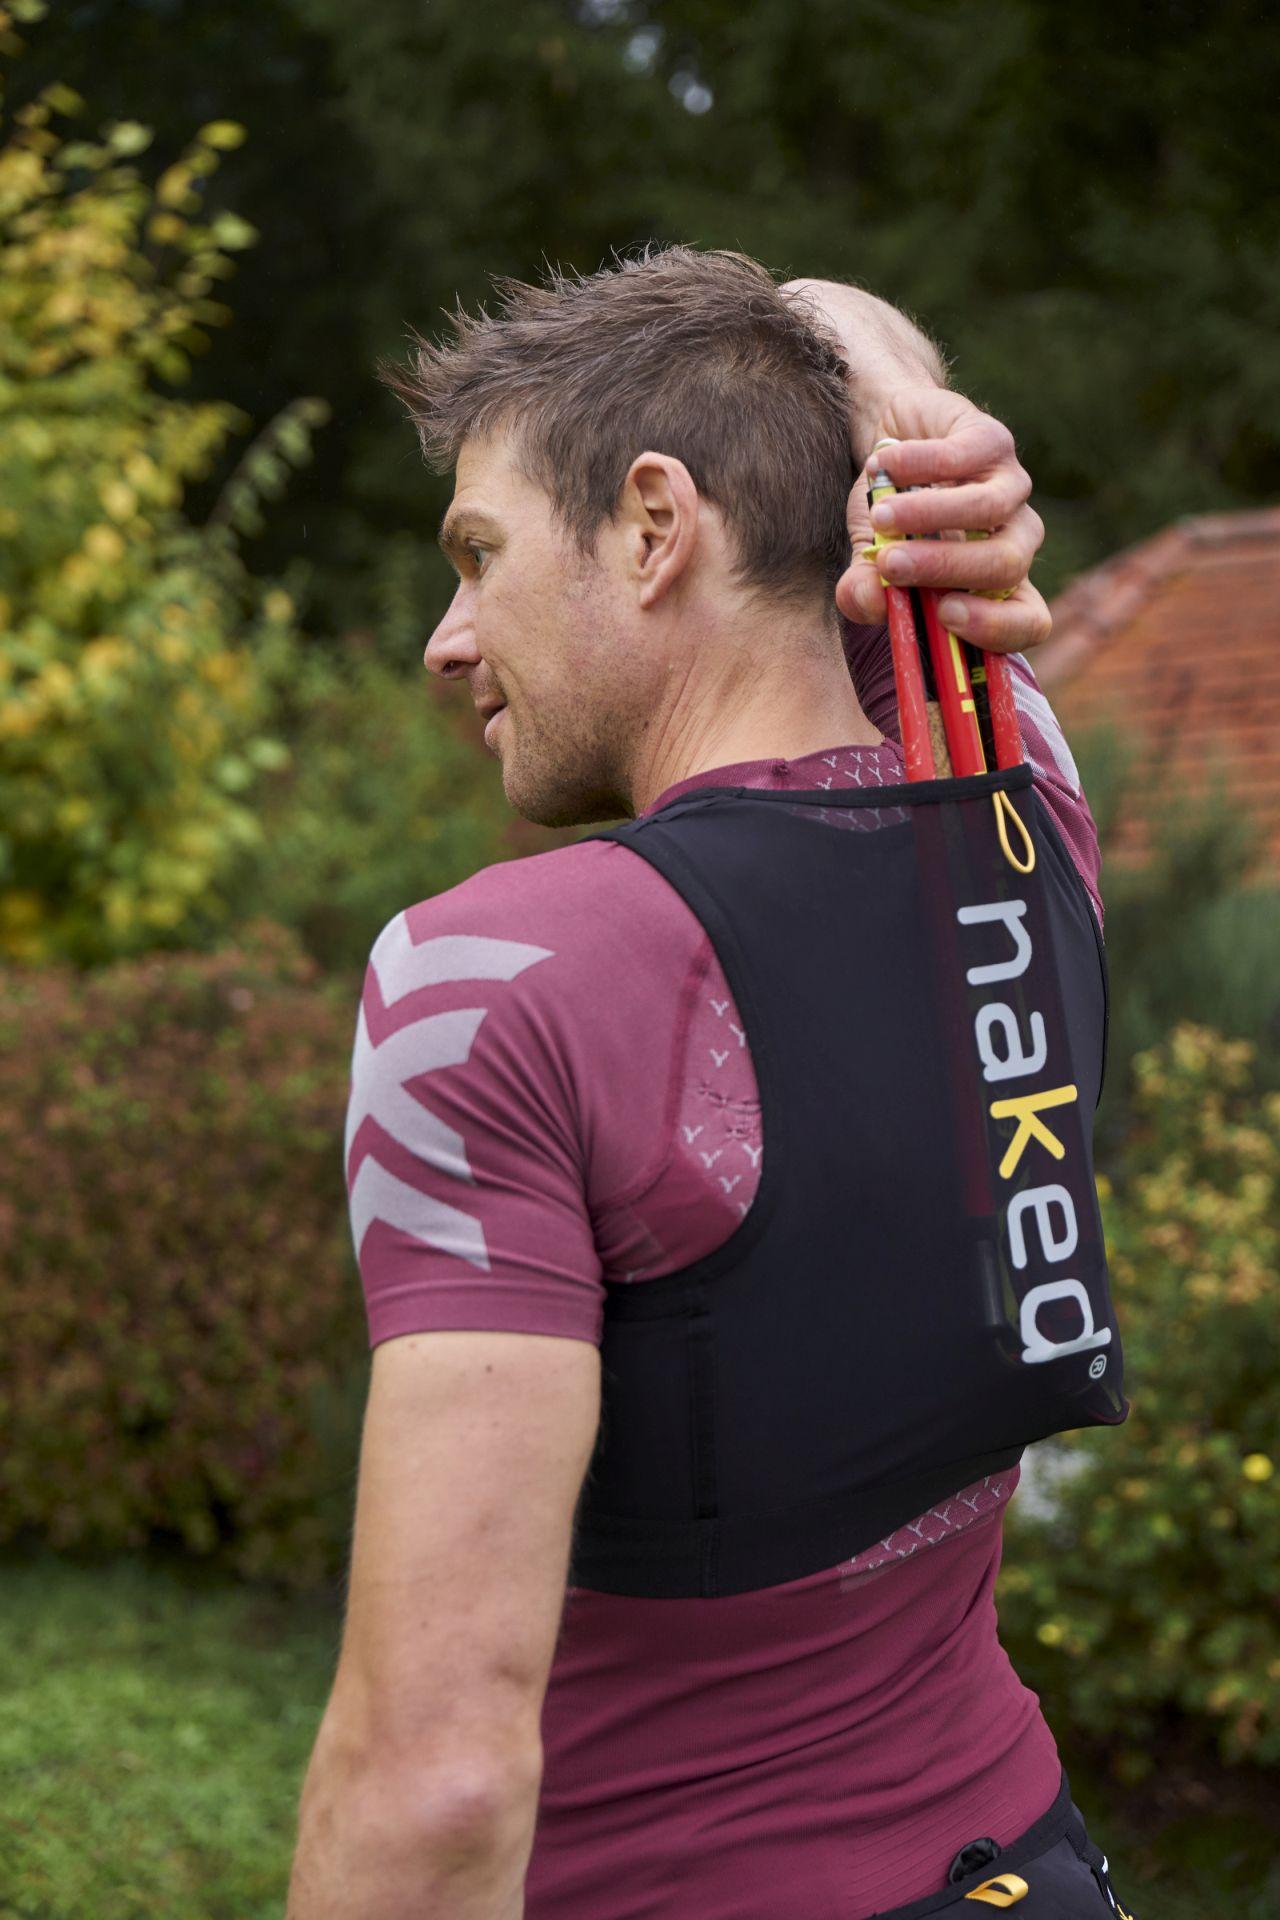 Naked Sports Innovations - Naked Running Vest und Naked